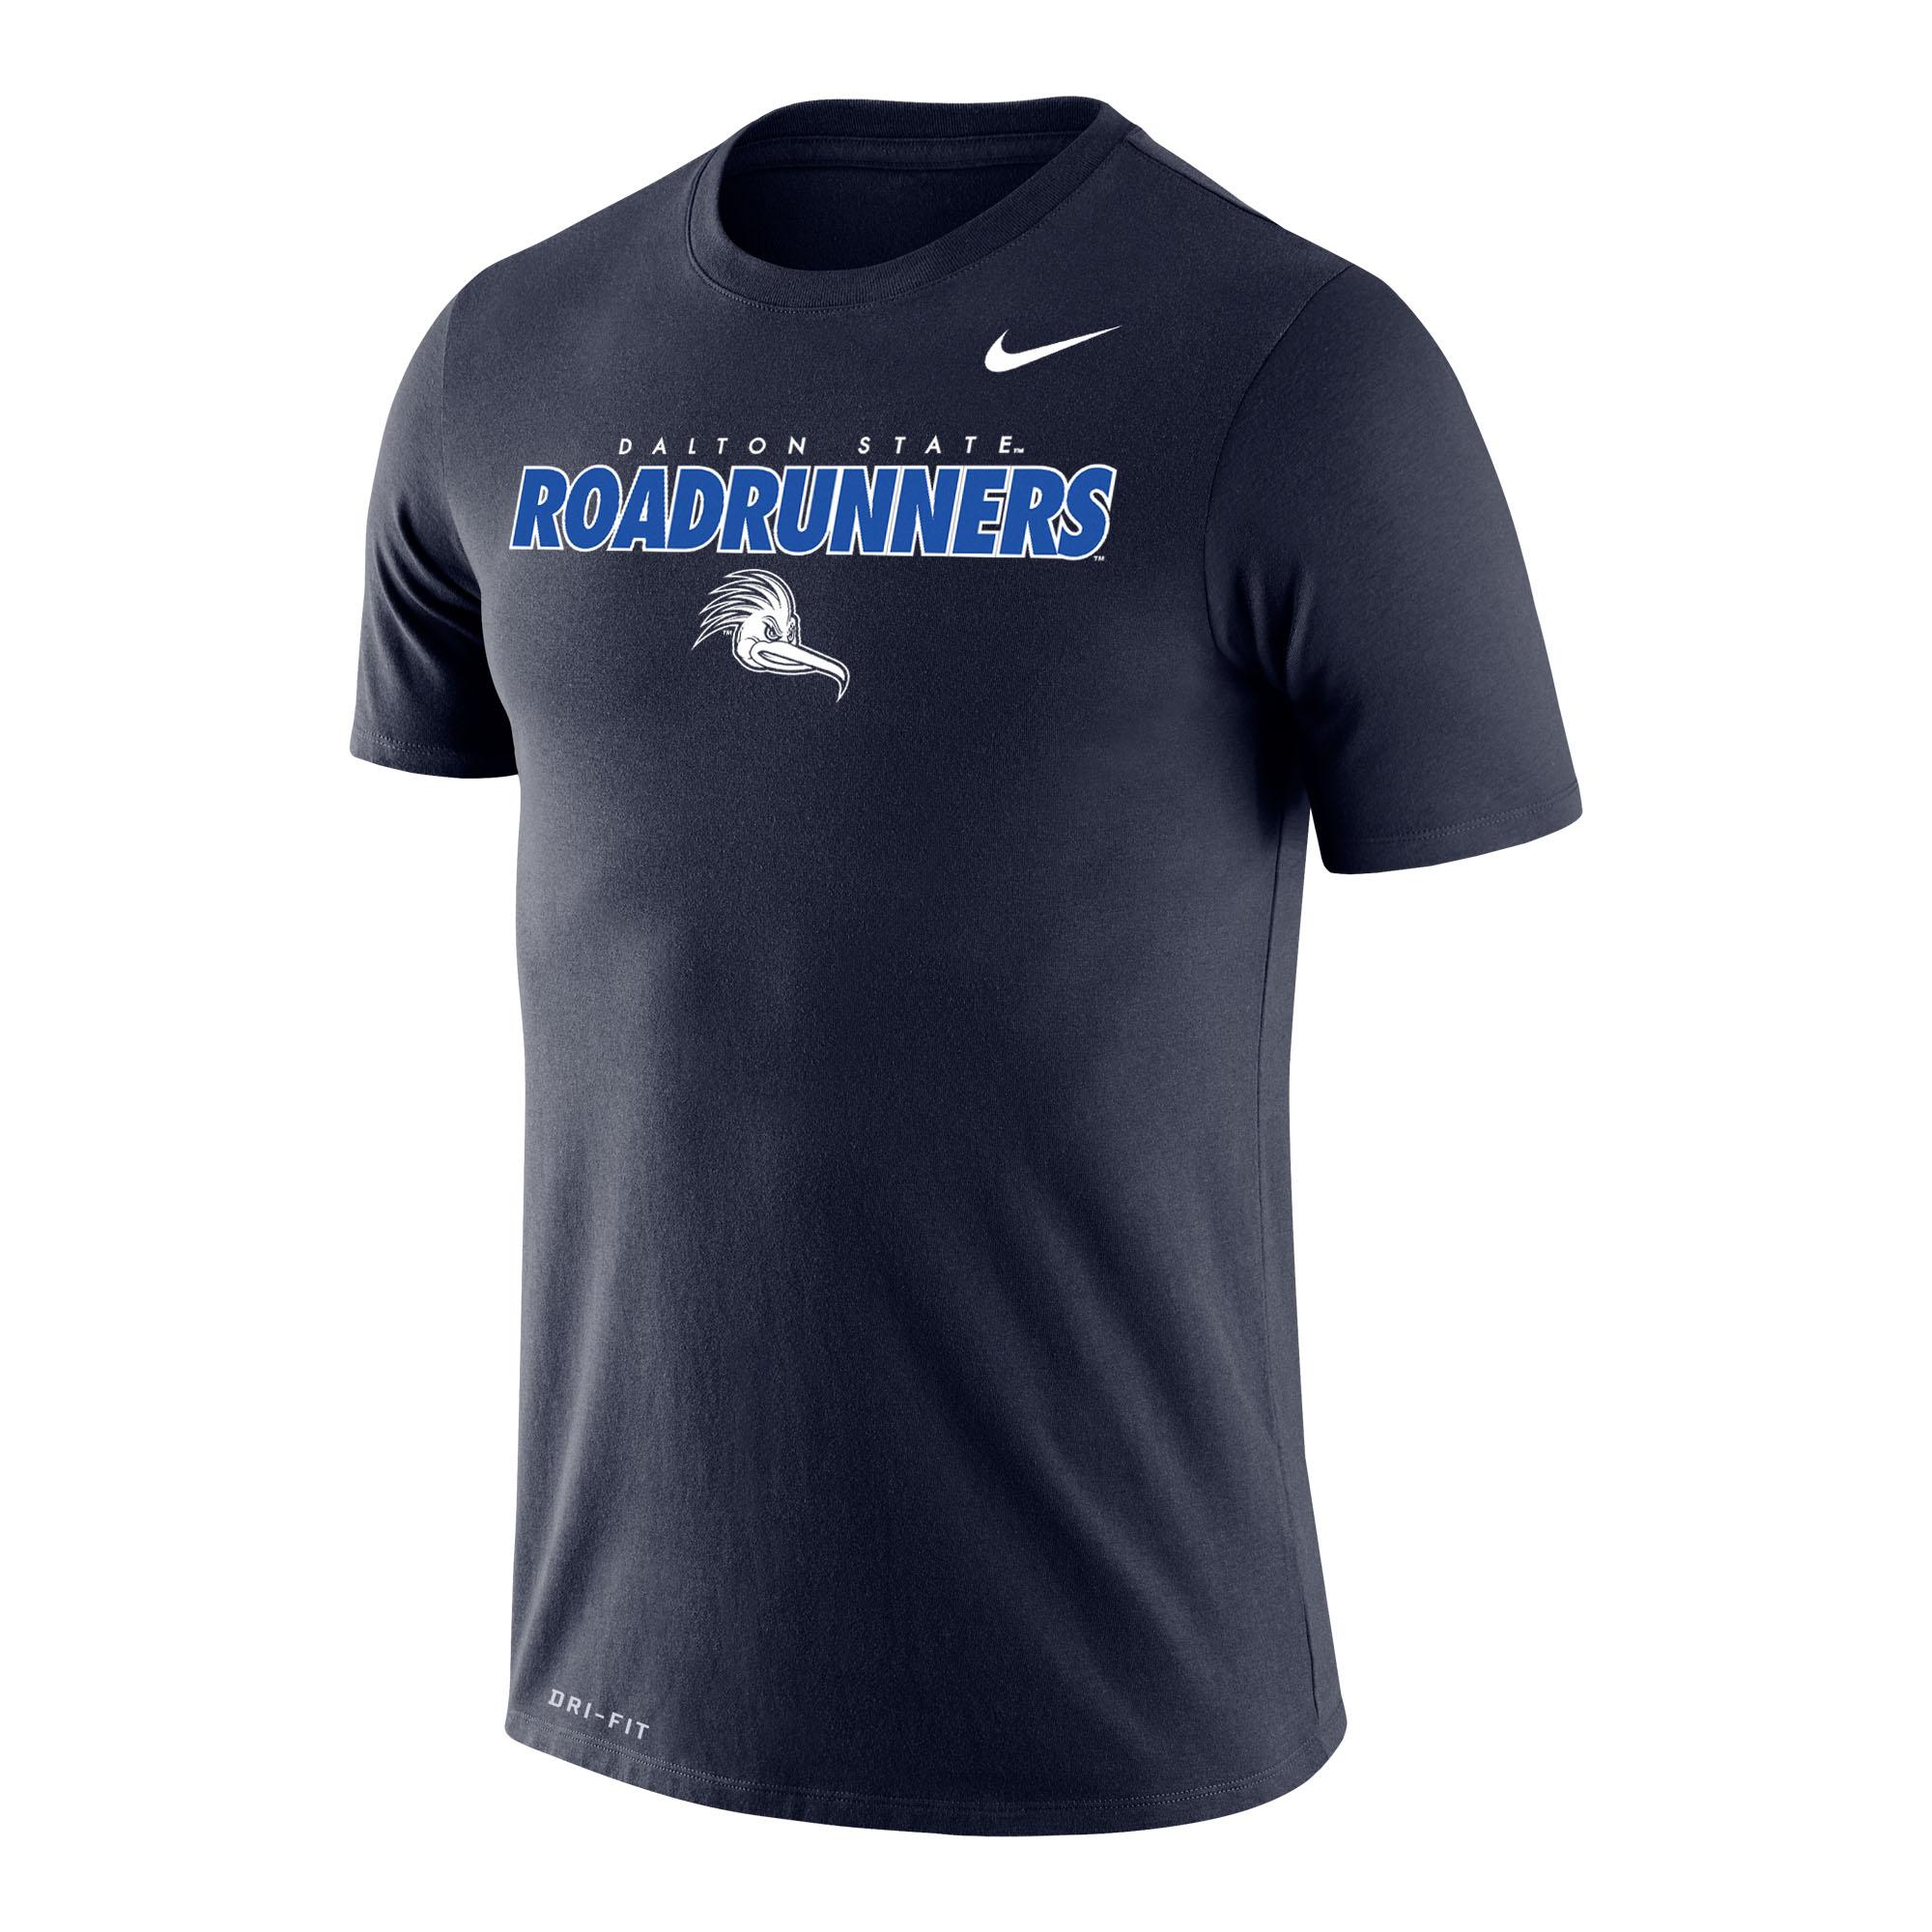 Dalton State Roadrunners Legend Nike® Shirt